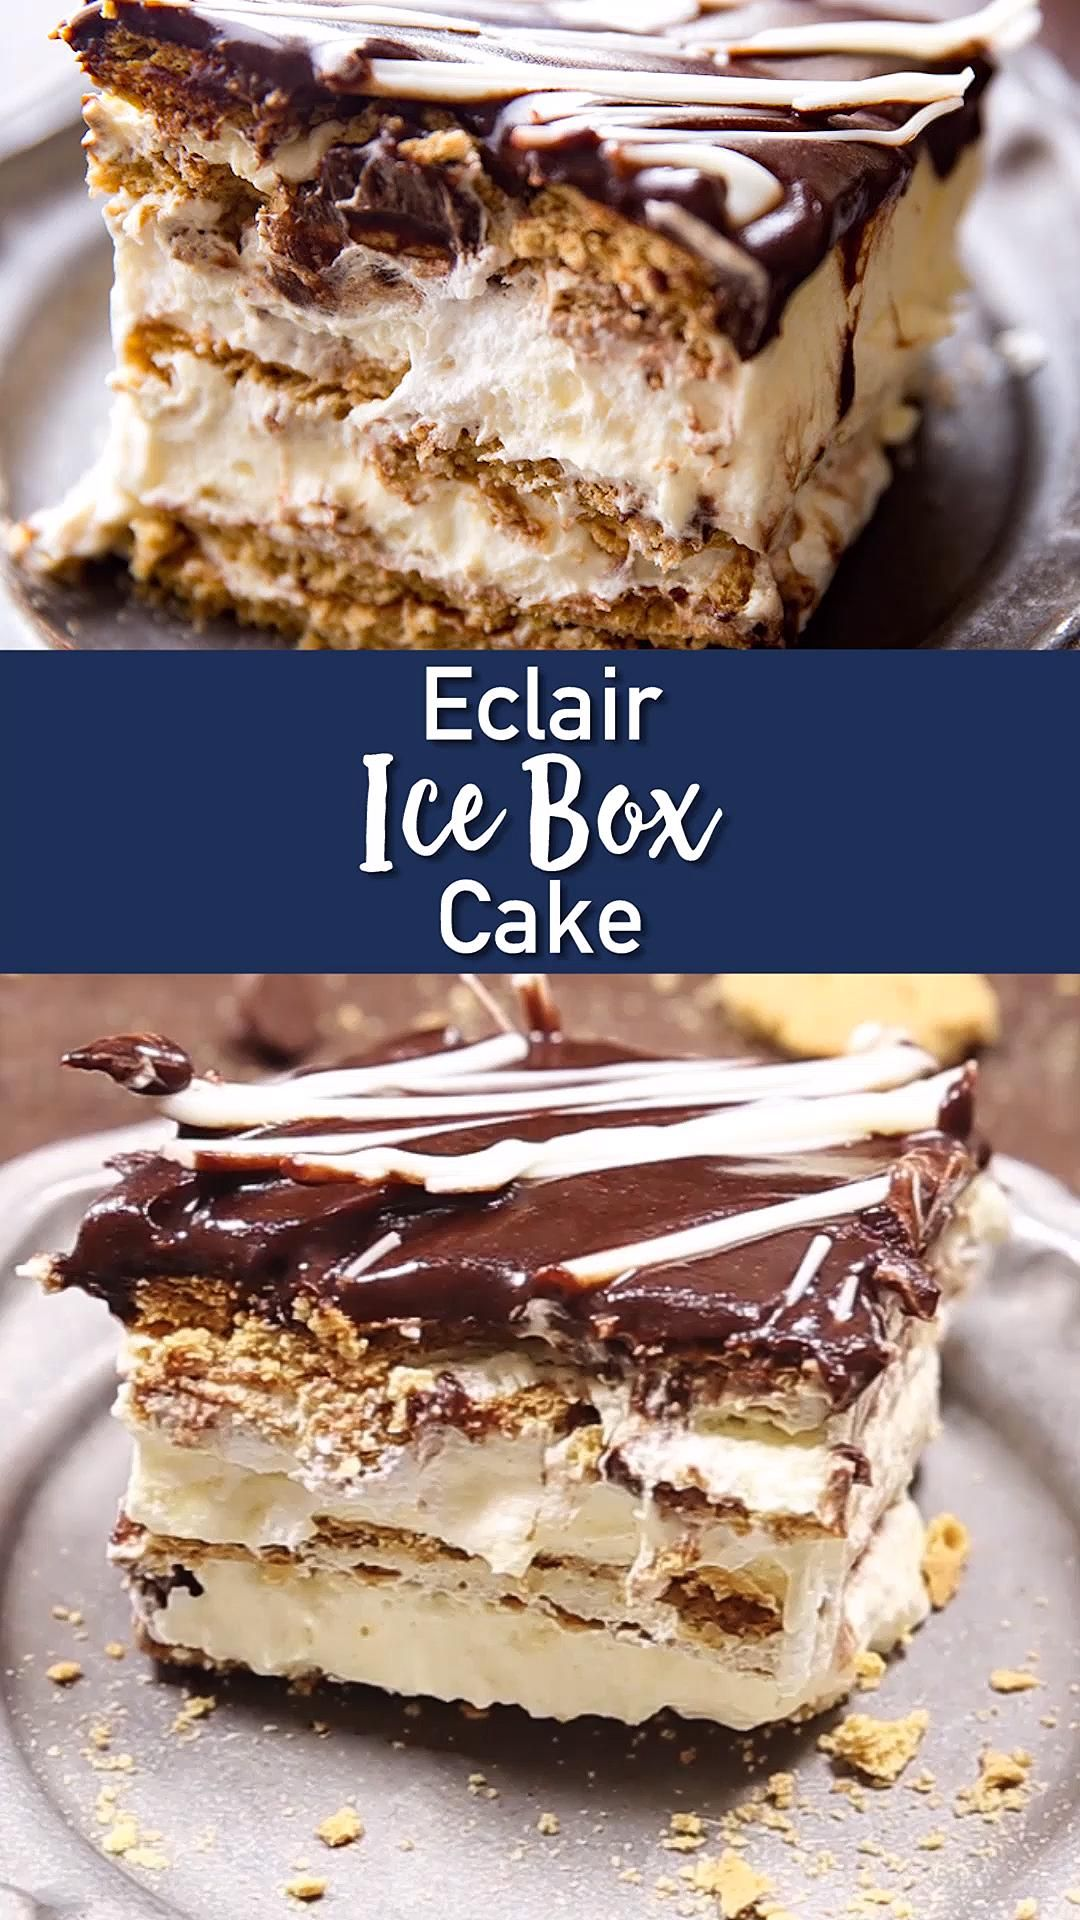 Photo of Eclair Ice Box Cake